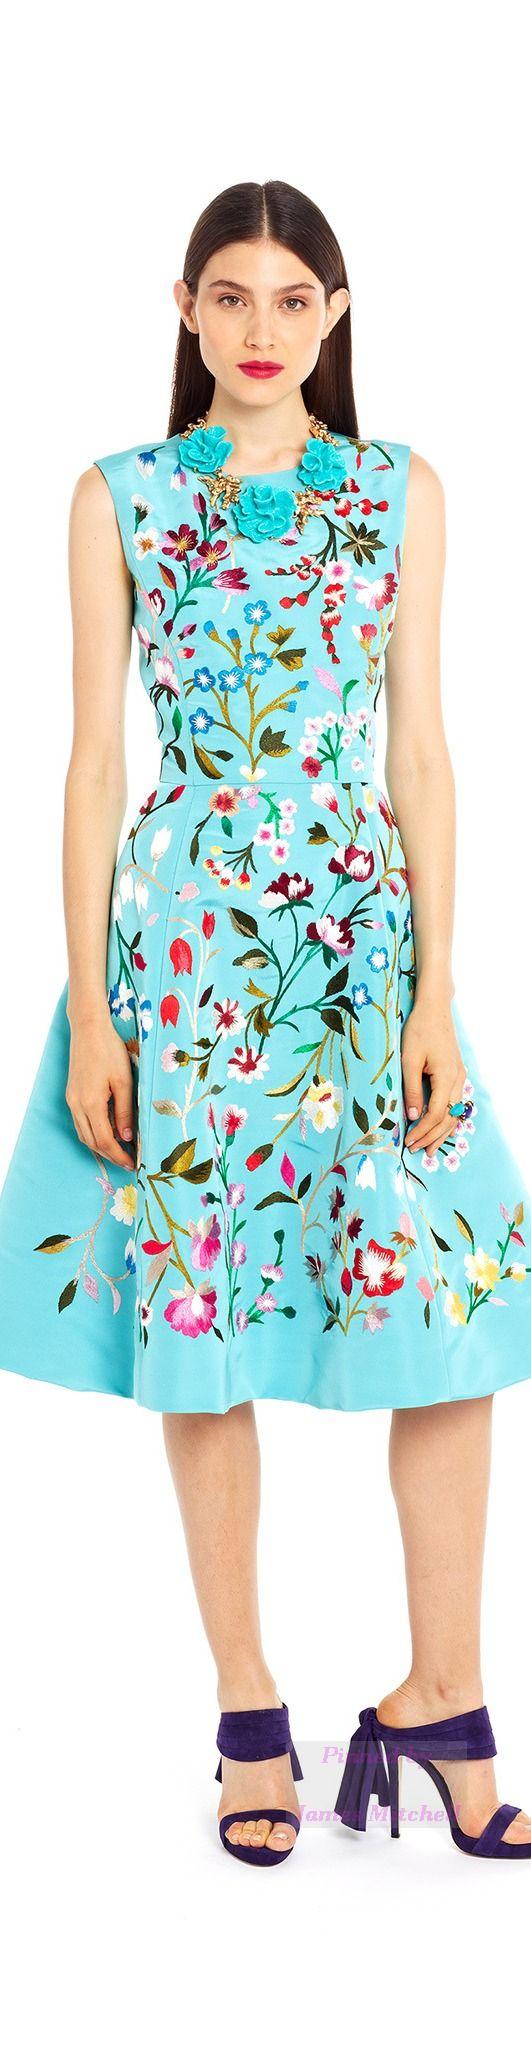 Oscar de la Renta Collection Spring 2015 Ready to Wear